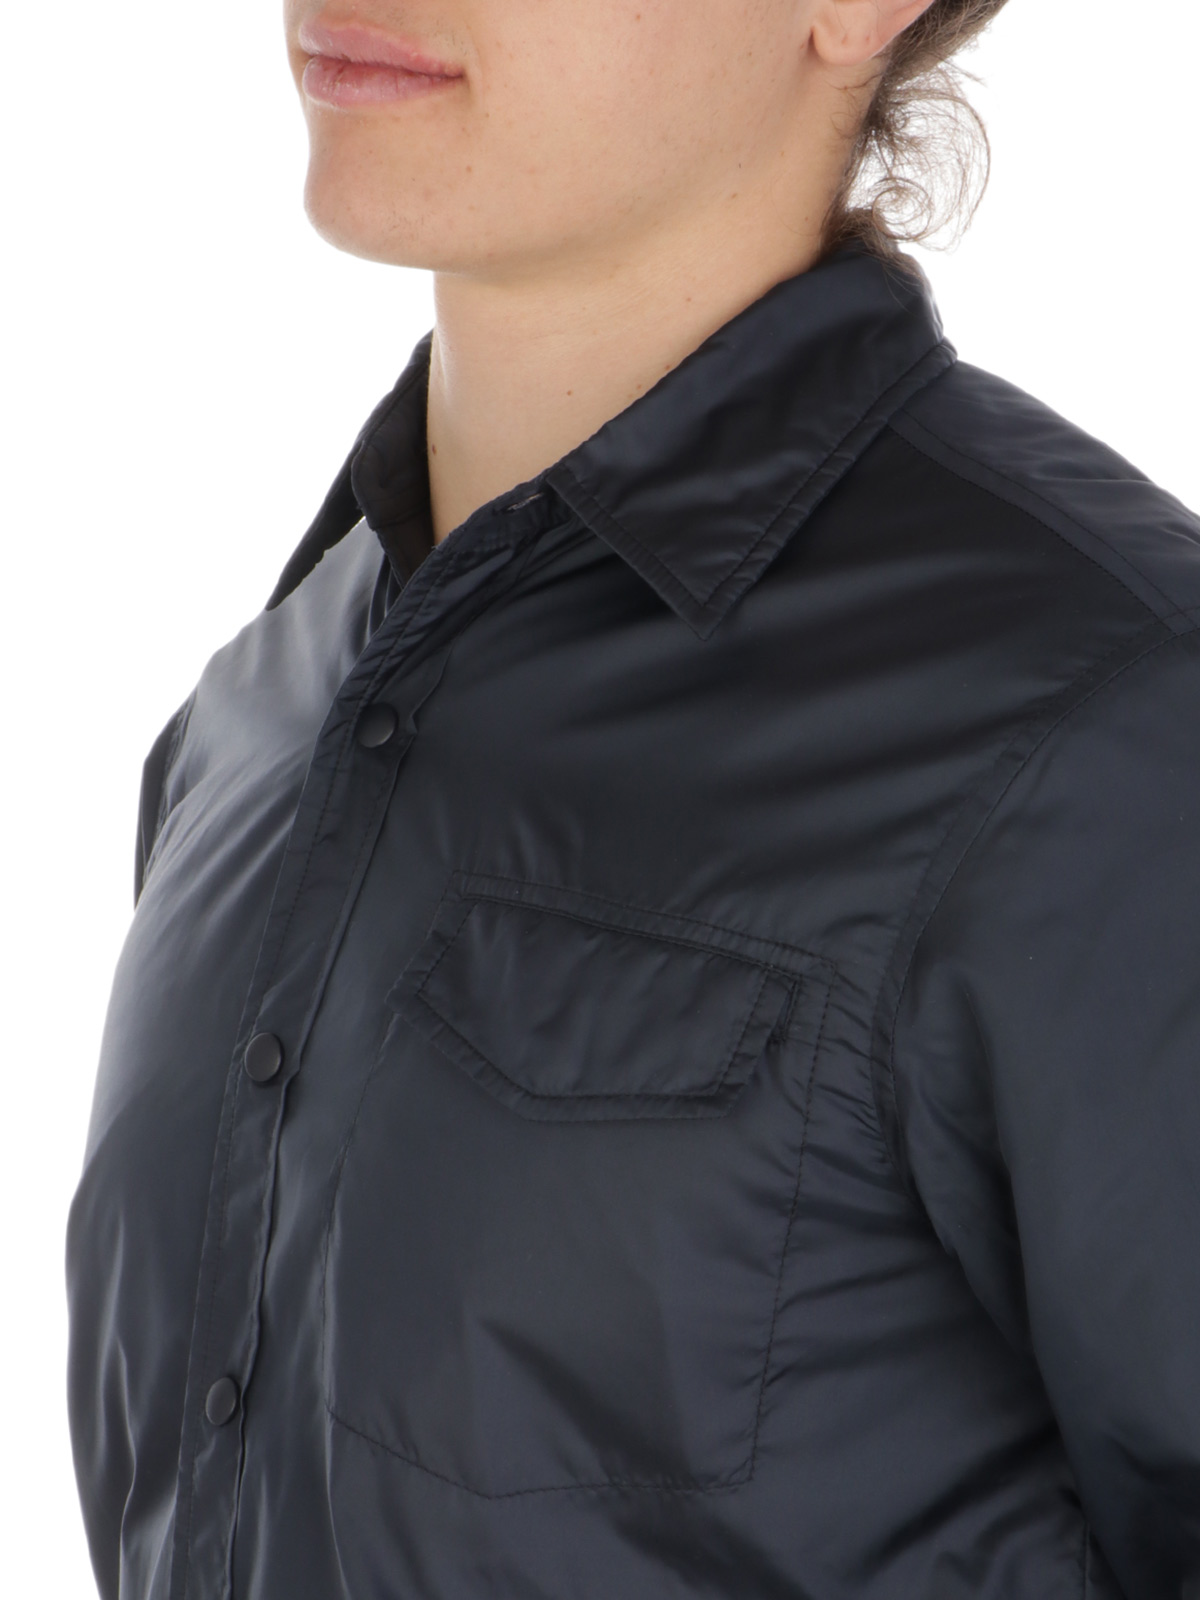 Immagine di ASPESI | Giacca Uomo a Camicia Marvin